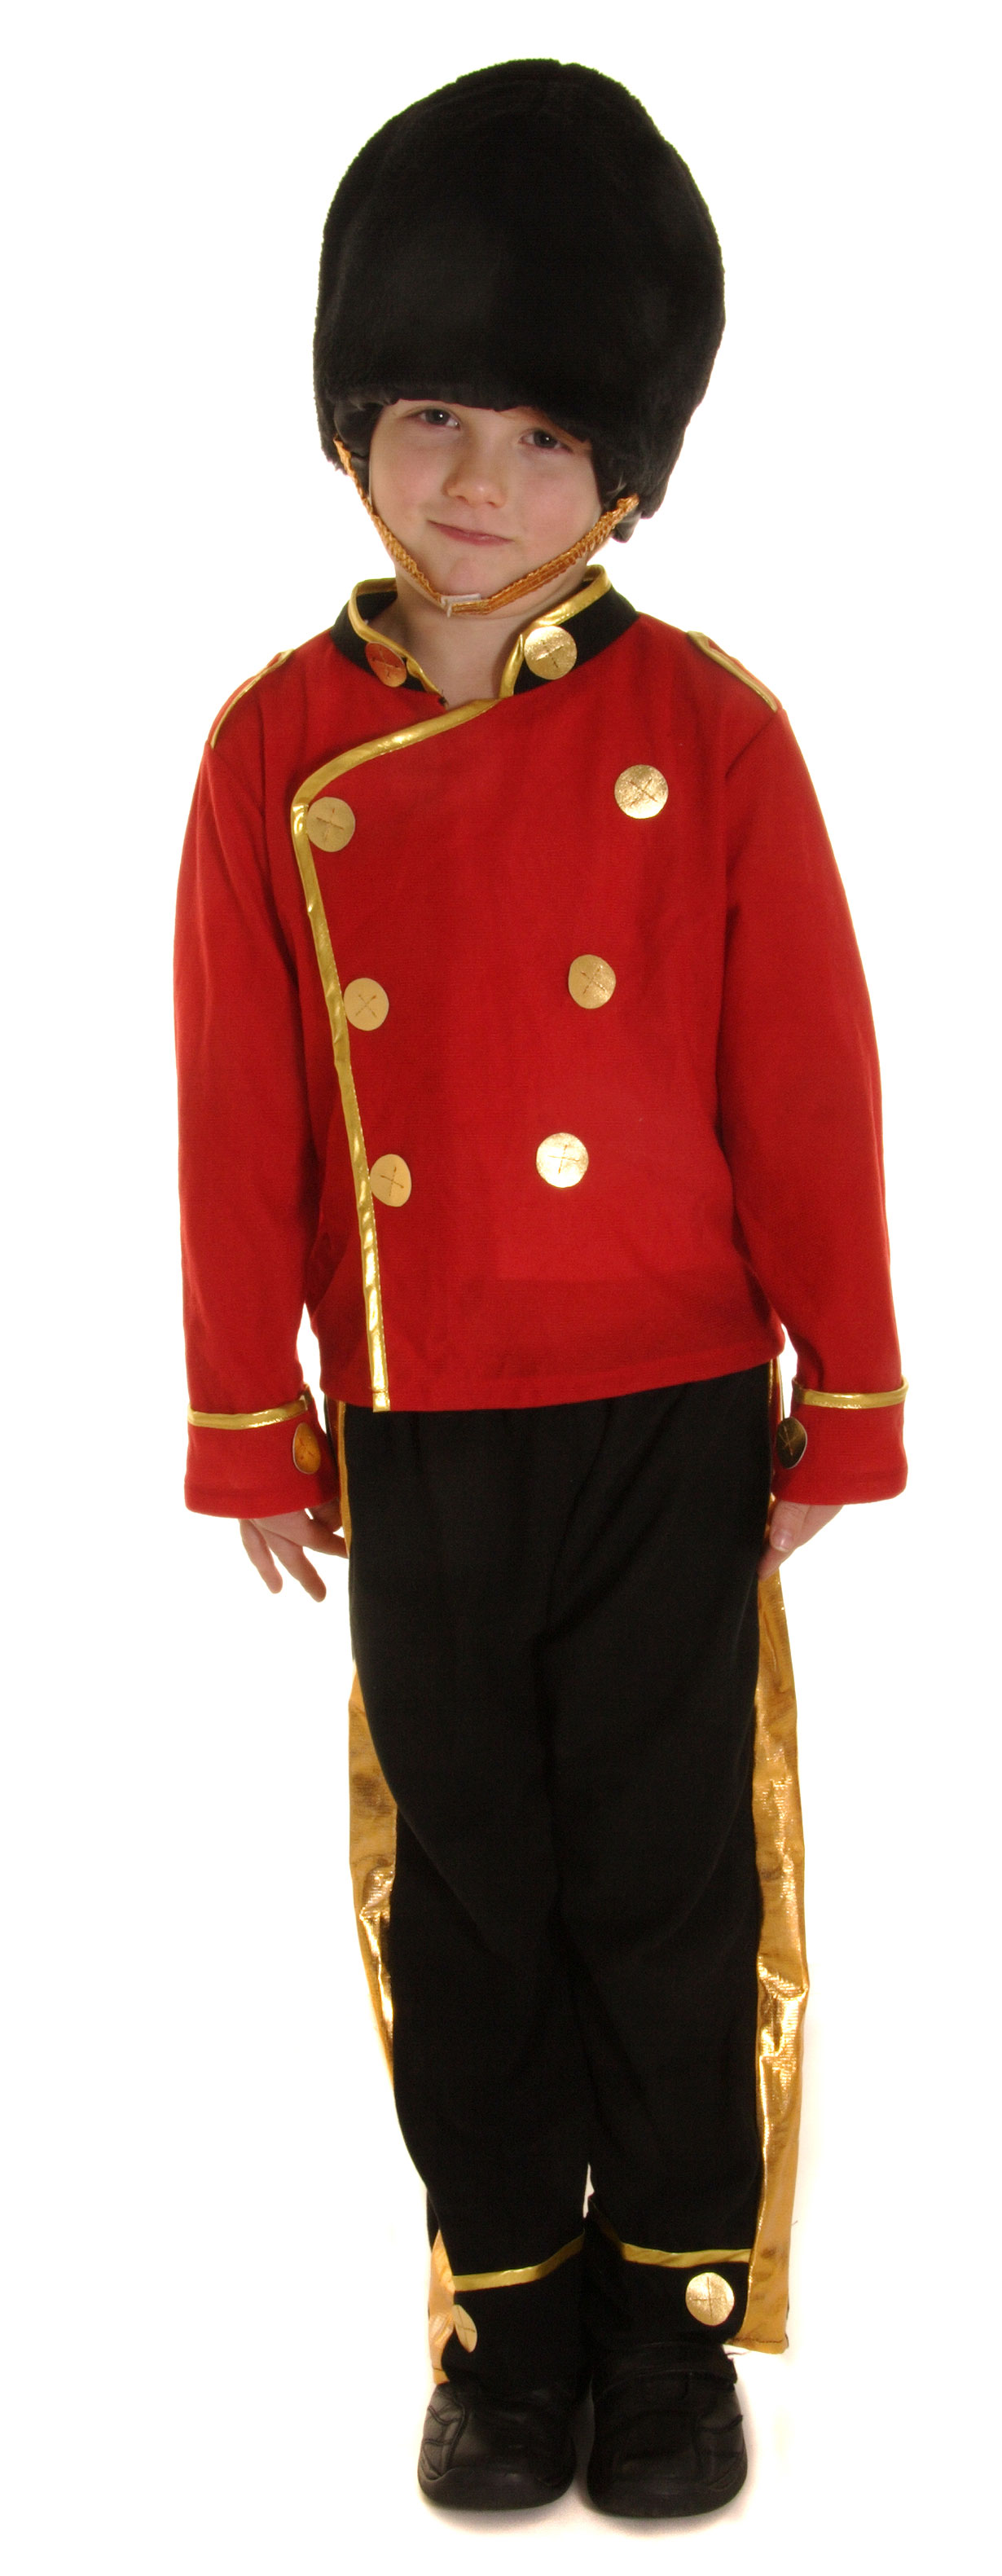 Boys Kids British Royal Guard Uniform Costume Jacket Hussar Drum Fancy Dress Top